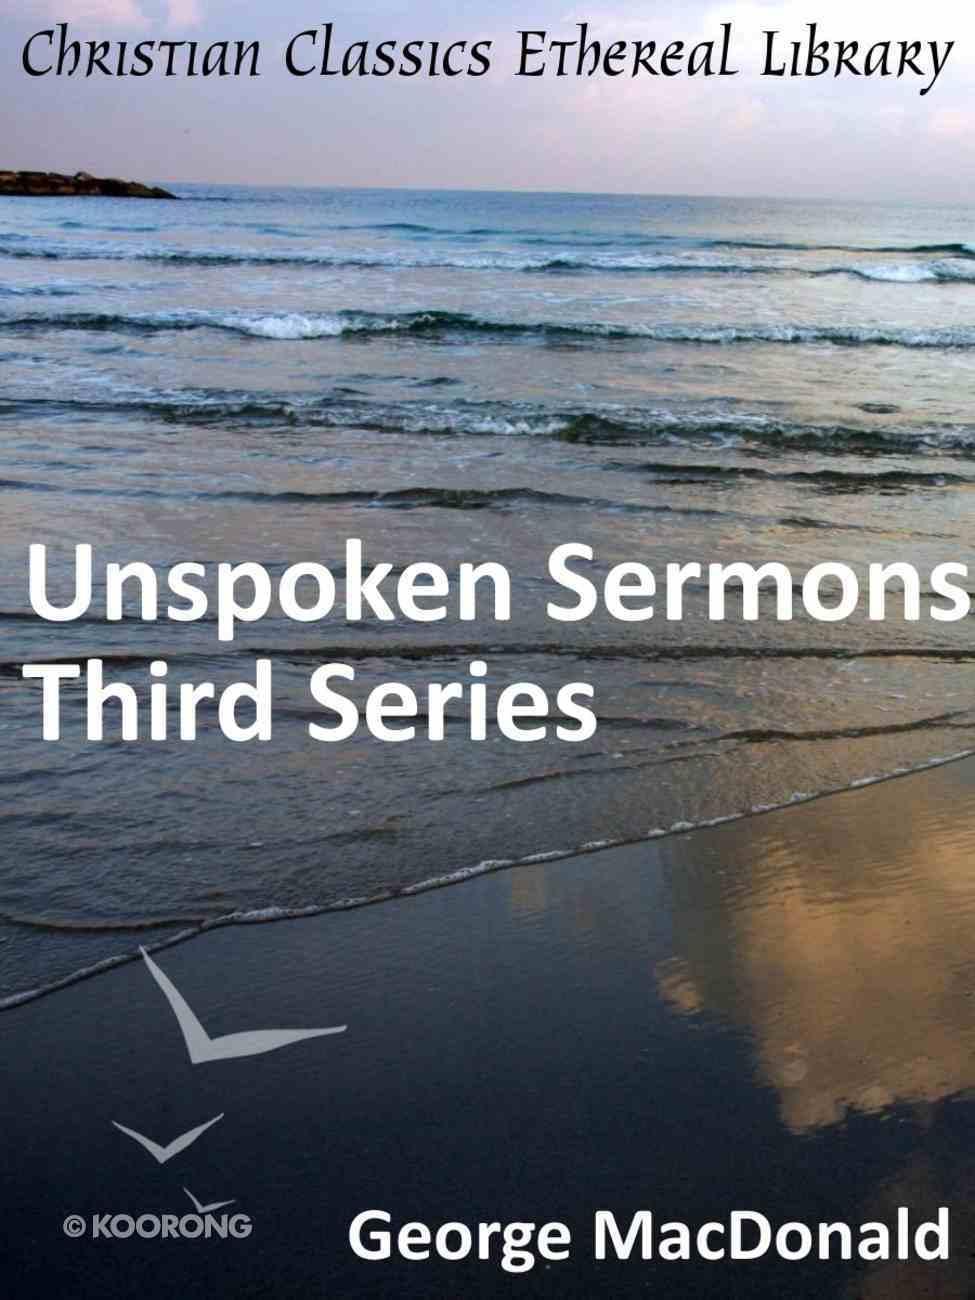 Unspoken Sermons Series Three eBook